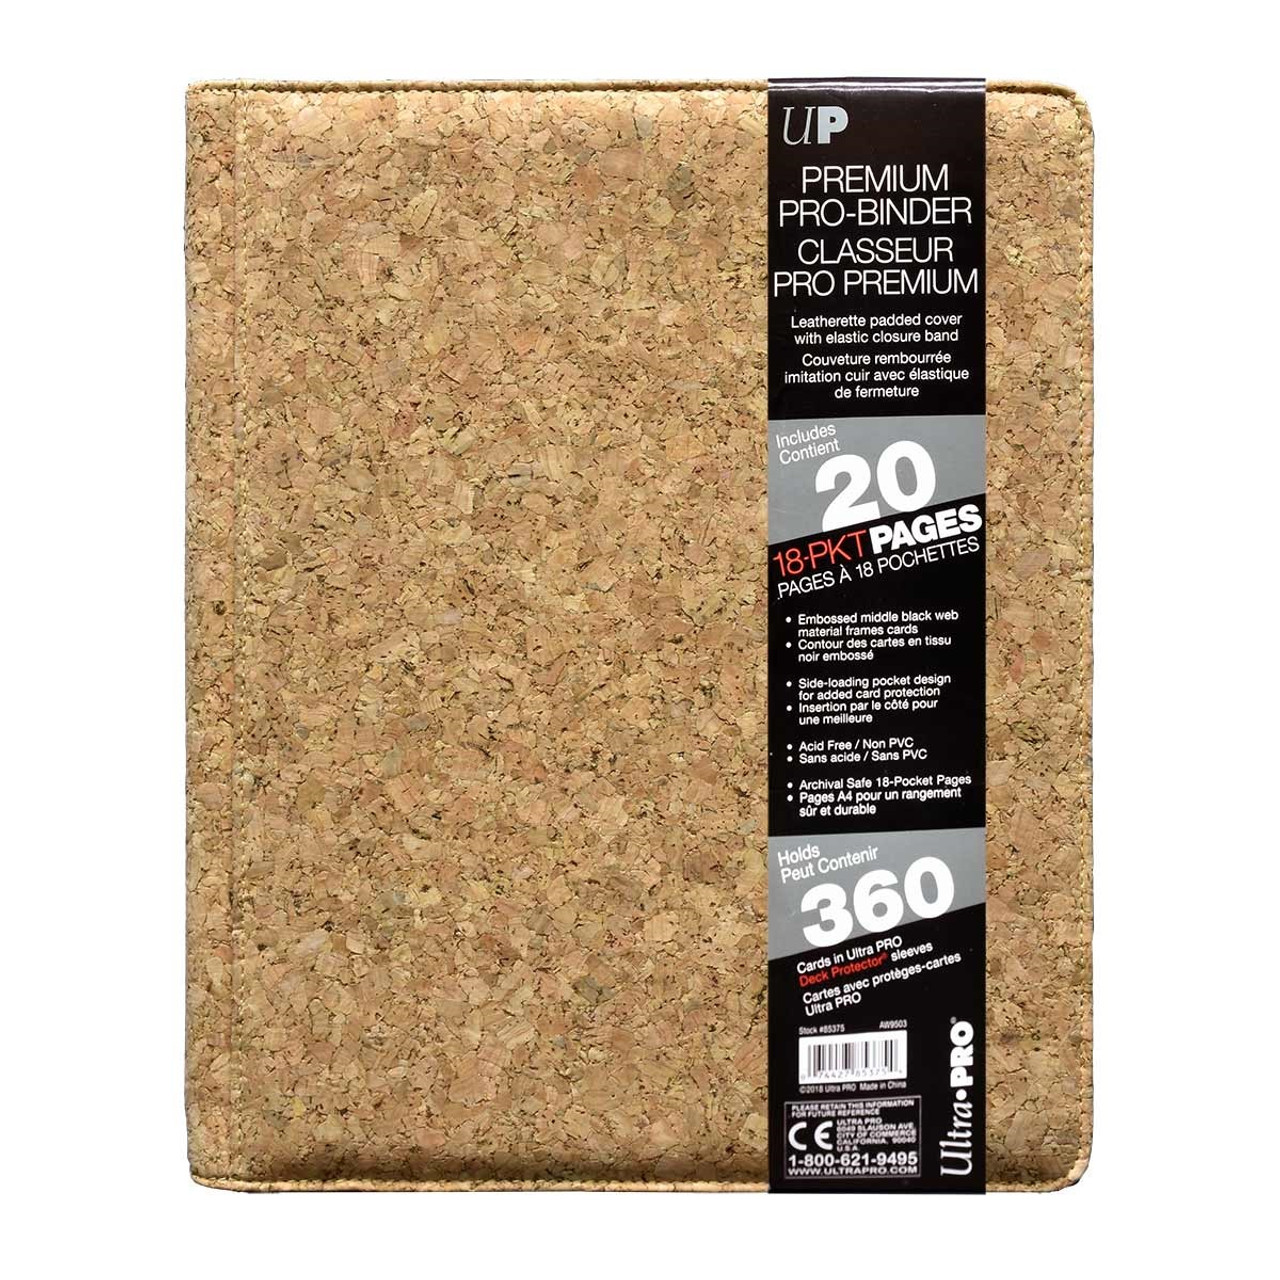 Ultra Pro 9 Premium Pro Binder- Cork - Special Order